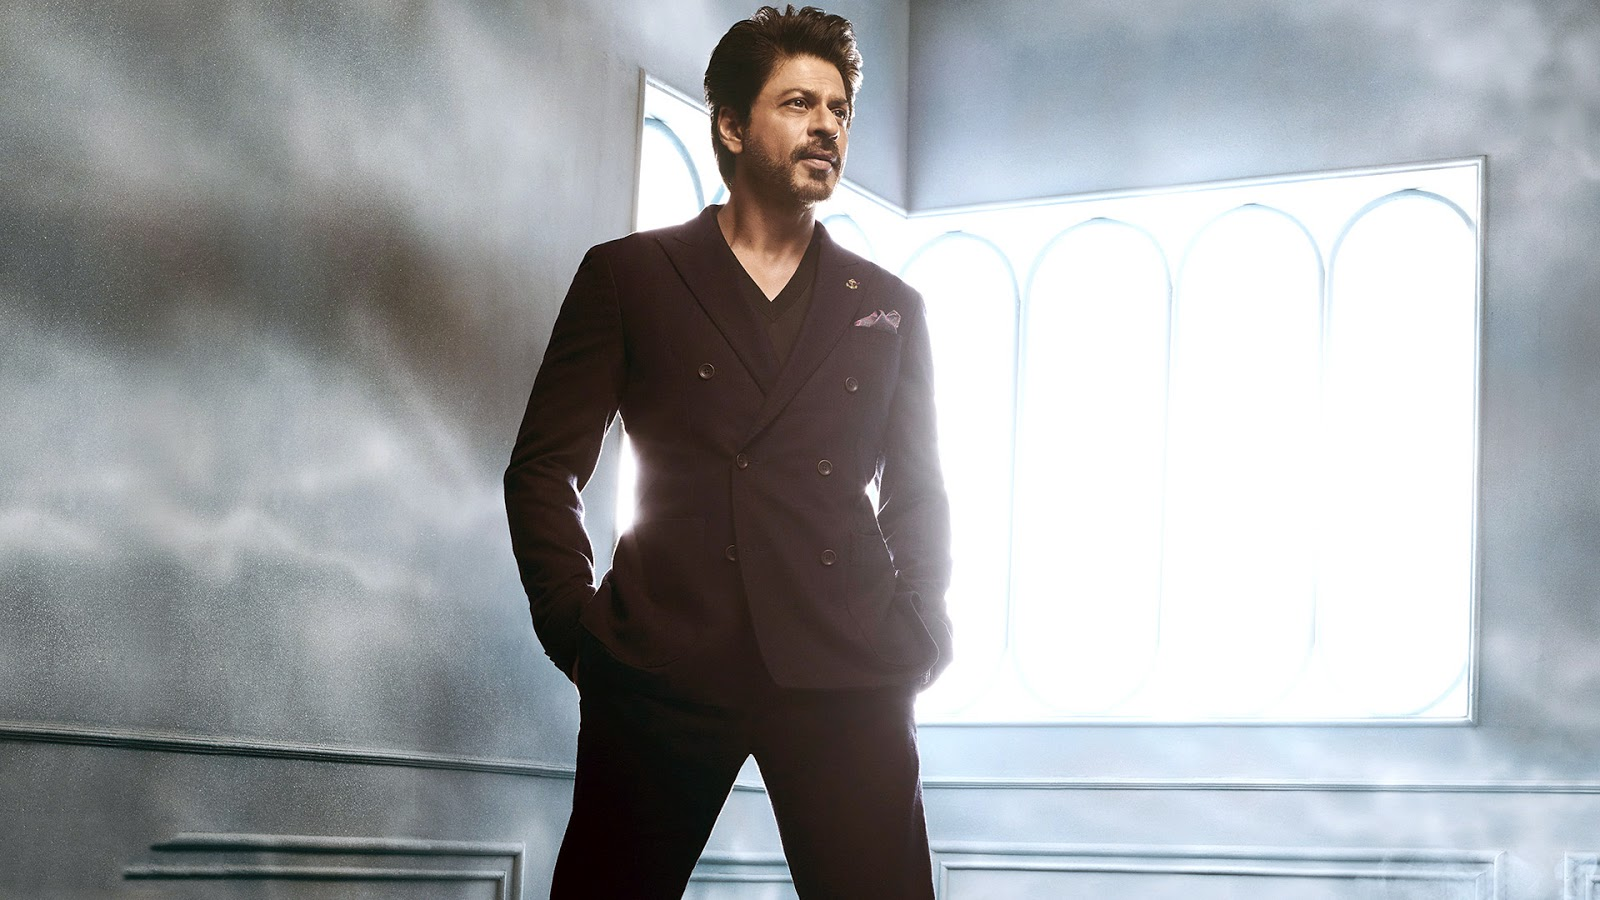 Shahrukh Khan Wallpapers Hd Download Free 1080p